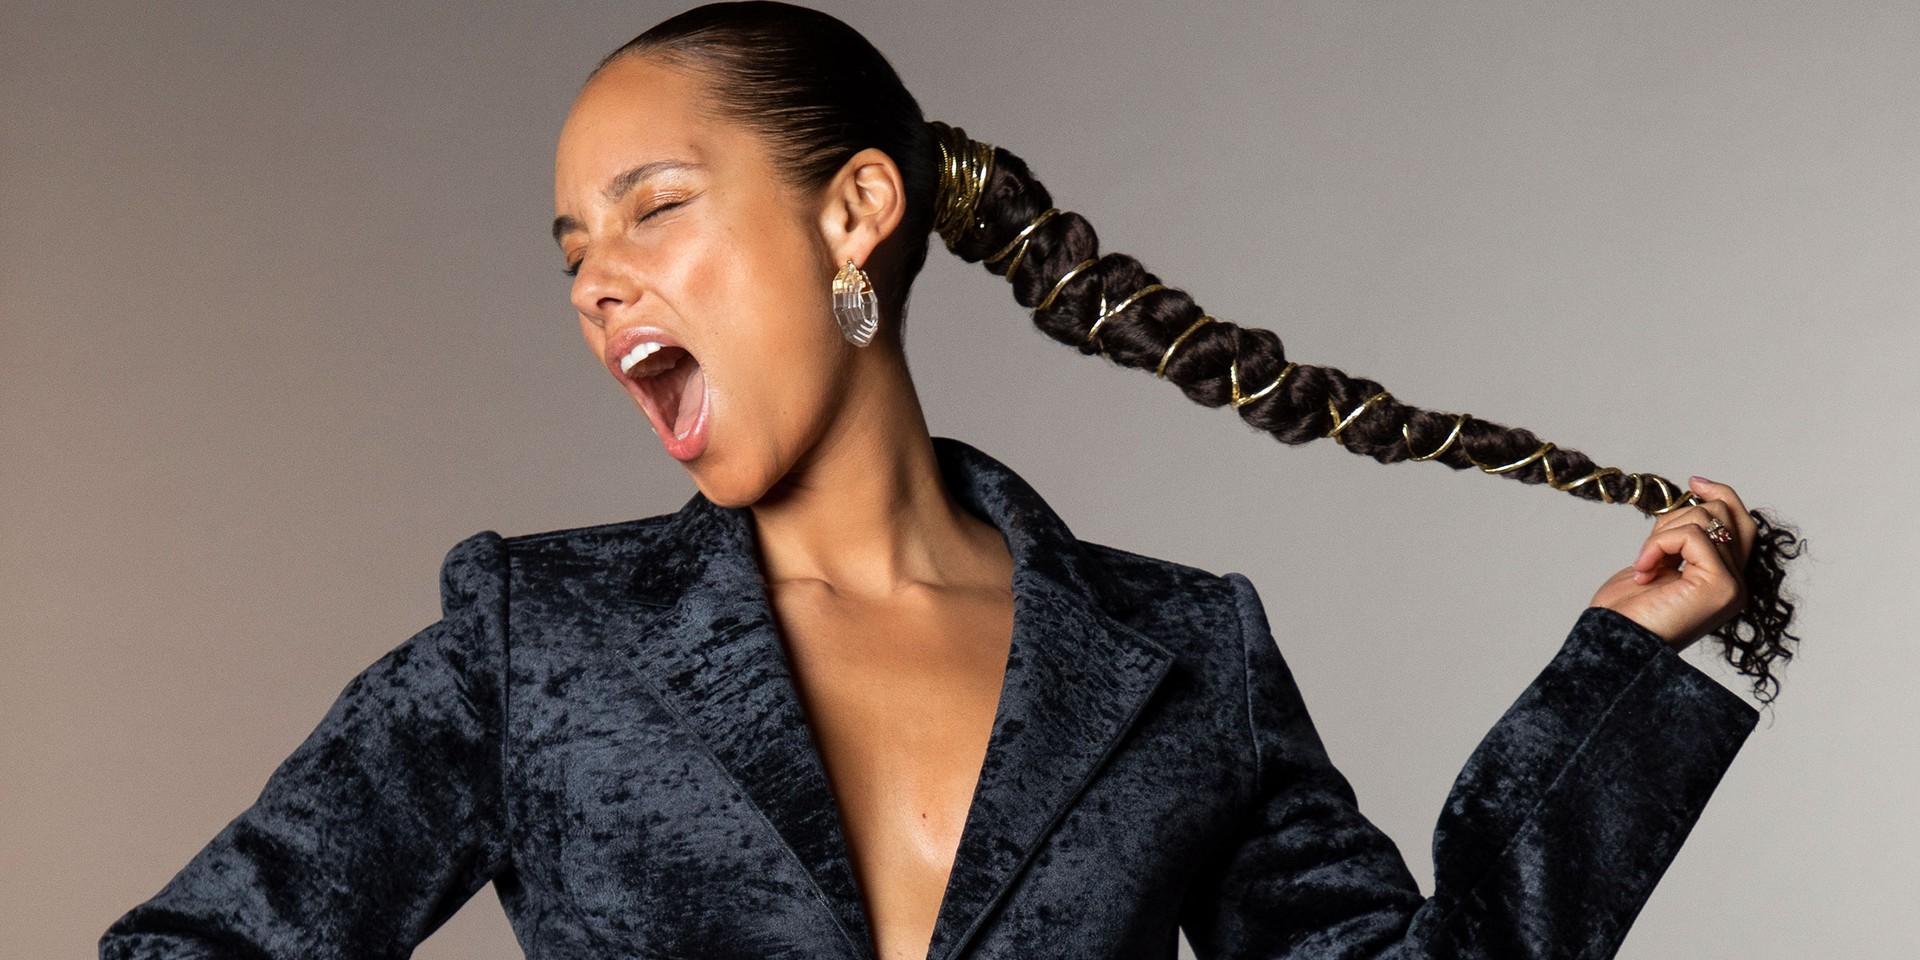 Alicia Keys releases breathtaking new single 'Raise a Man' following Grammys hosting stint